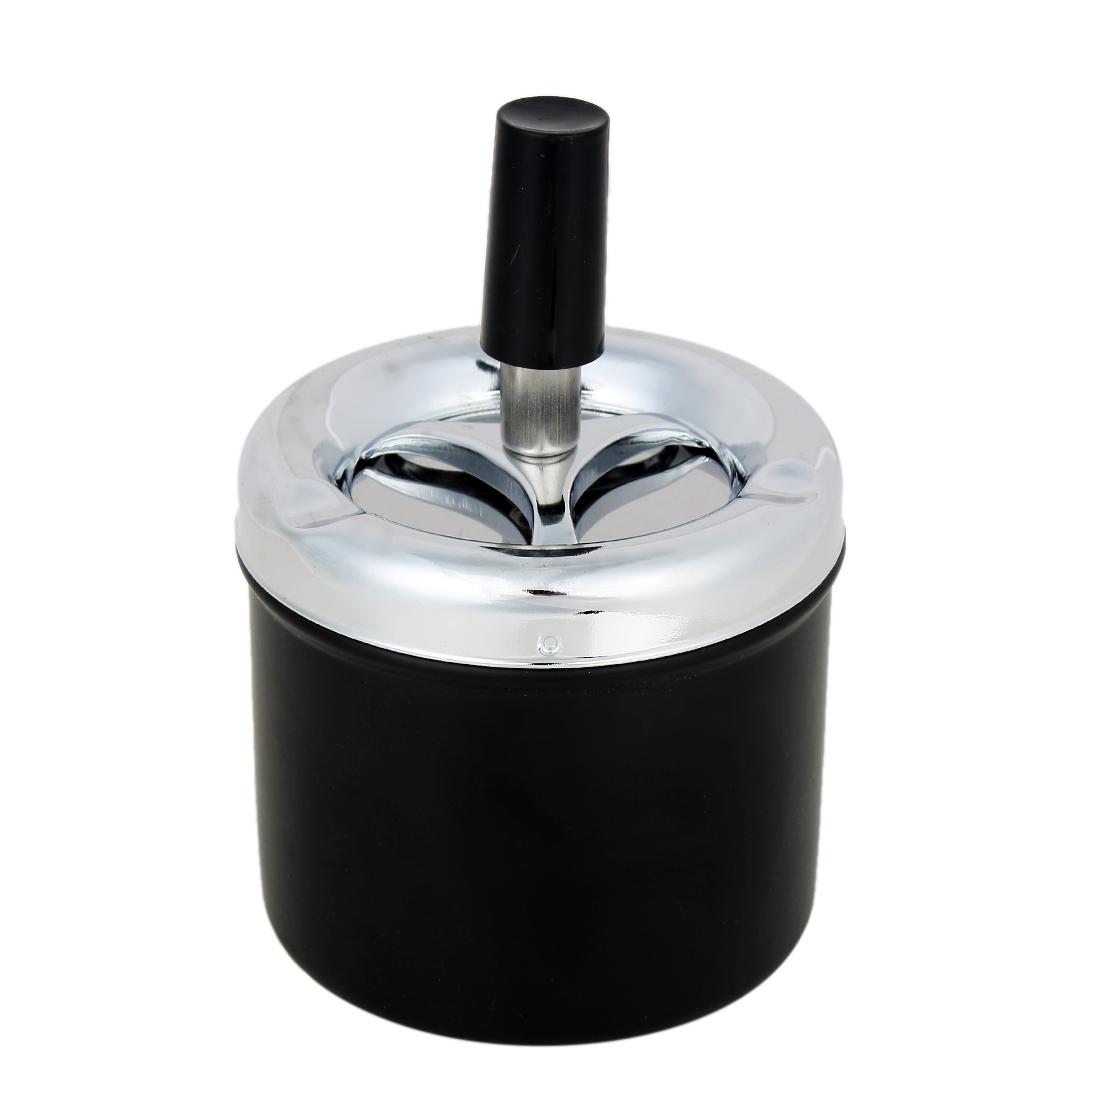 Cup Design Ashtray Cigarette Butt Bucket Car Home Office